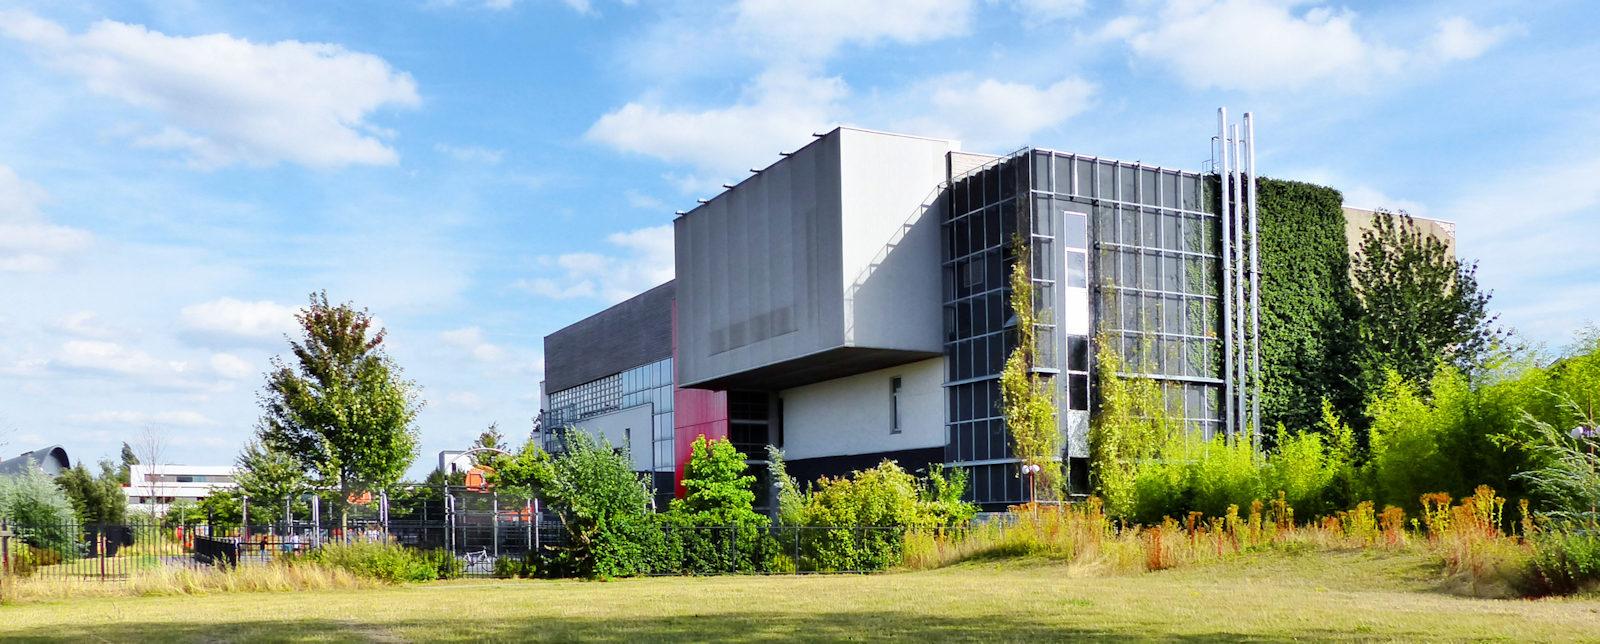 Salle de Sport L'Atelier, Tourcoing Virolois.